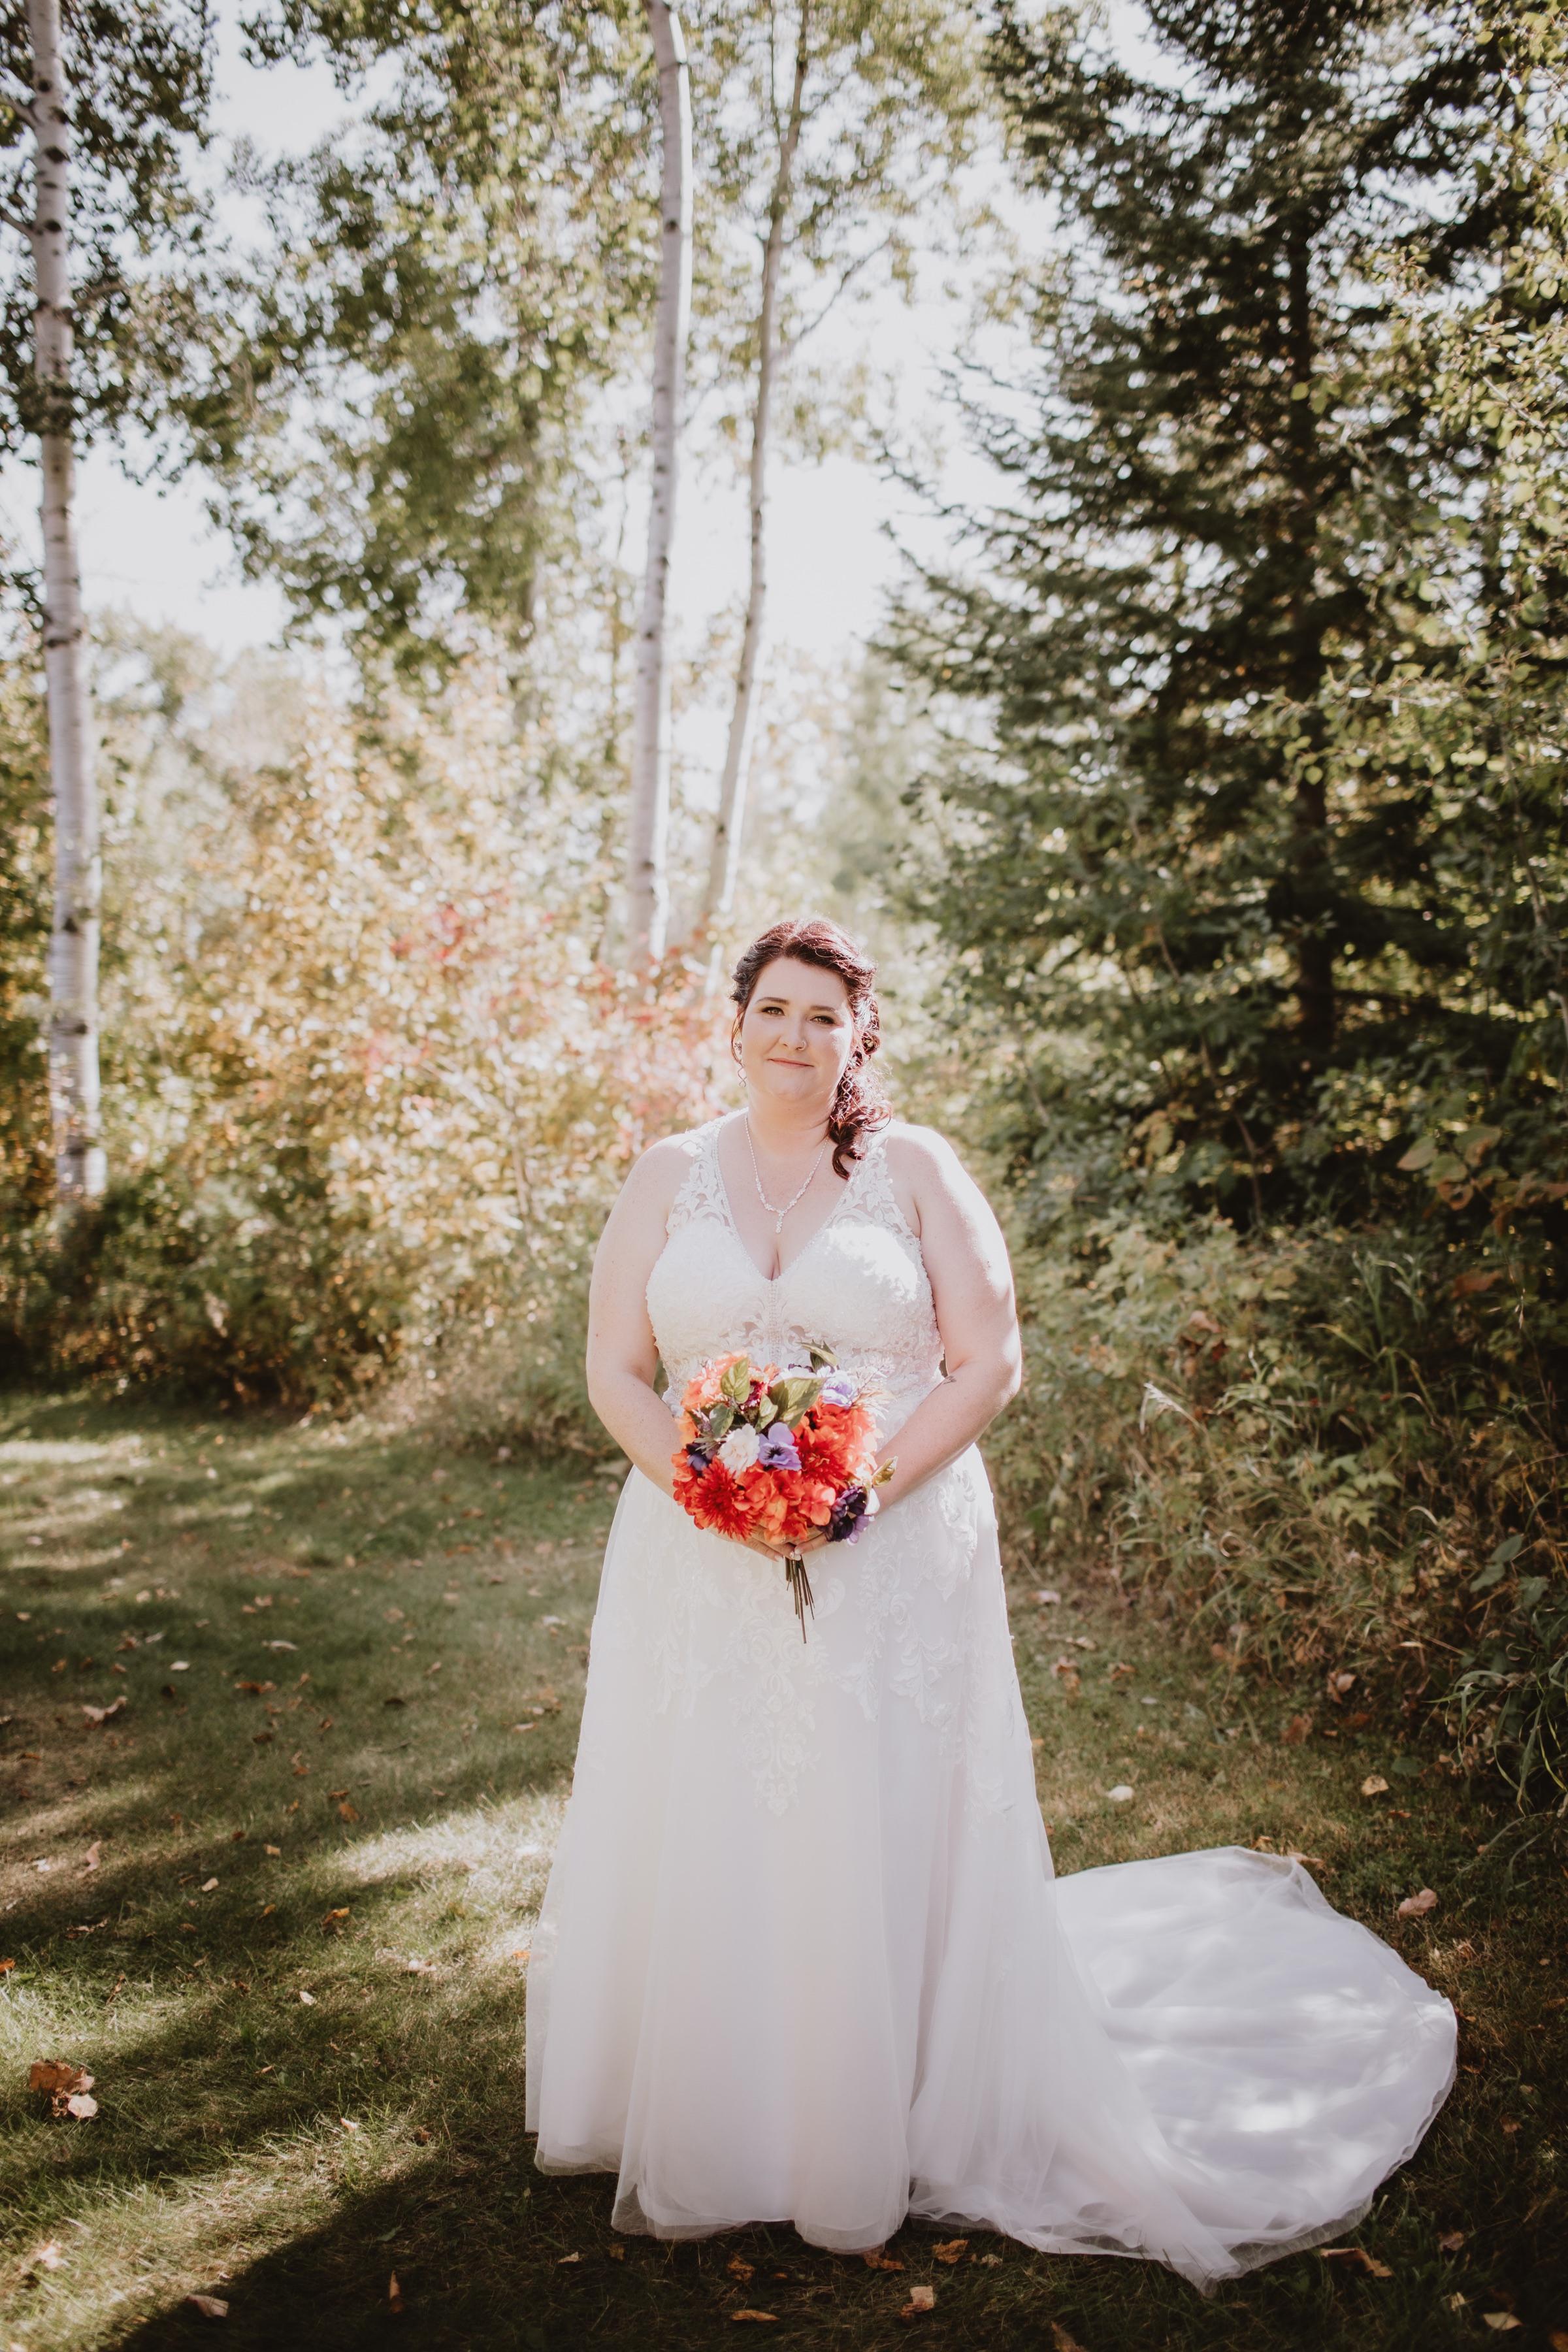 Fall Manitoba Bride at Rivers Edge Resort in Elma, Manitoba.